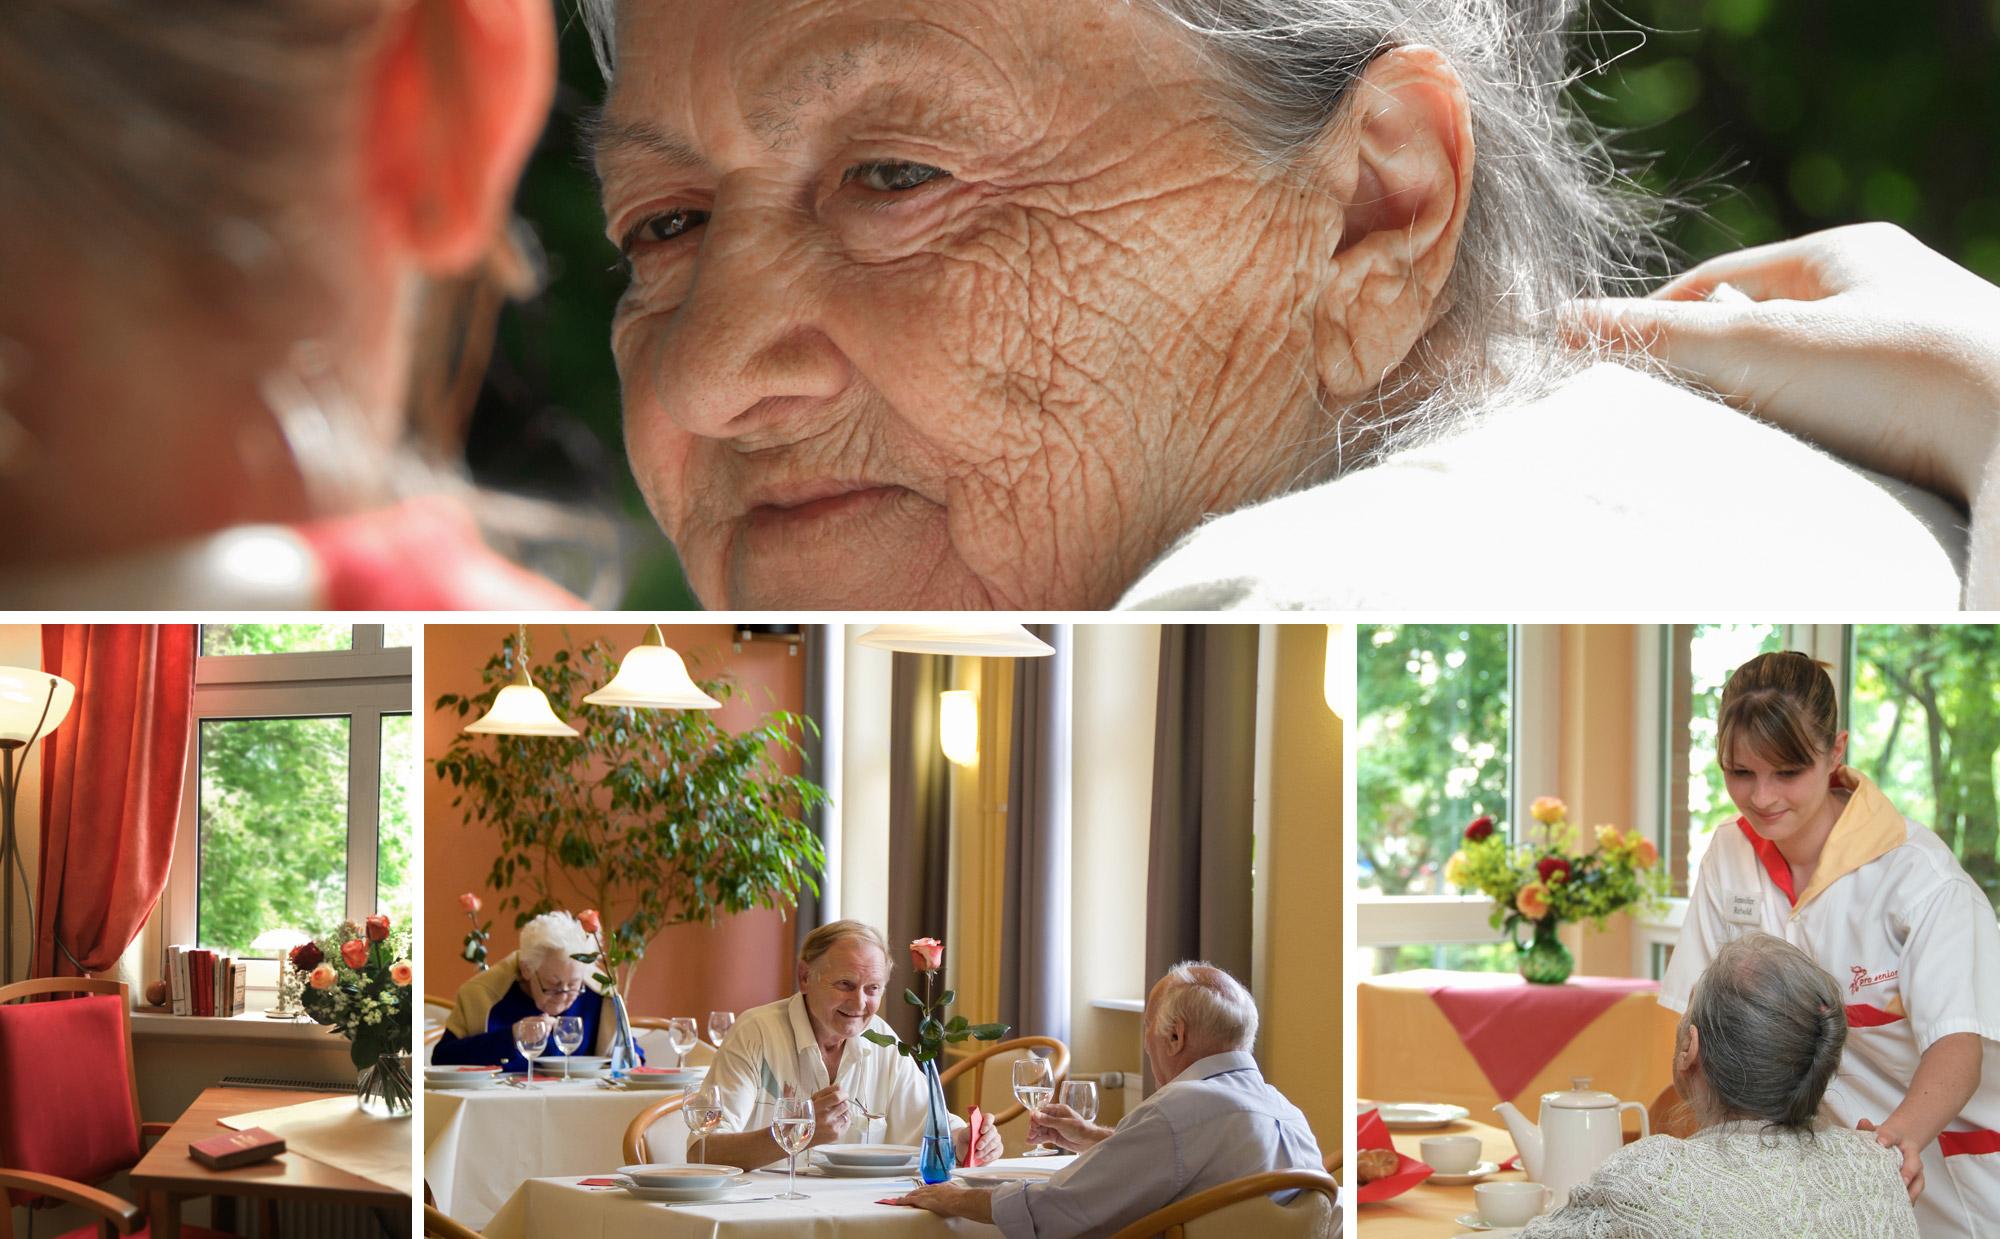 Prospekt Altenpflege Seniorenresidenz Pro Seniore